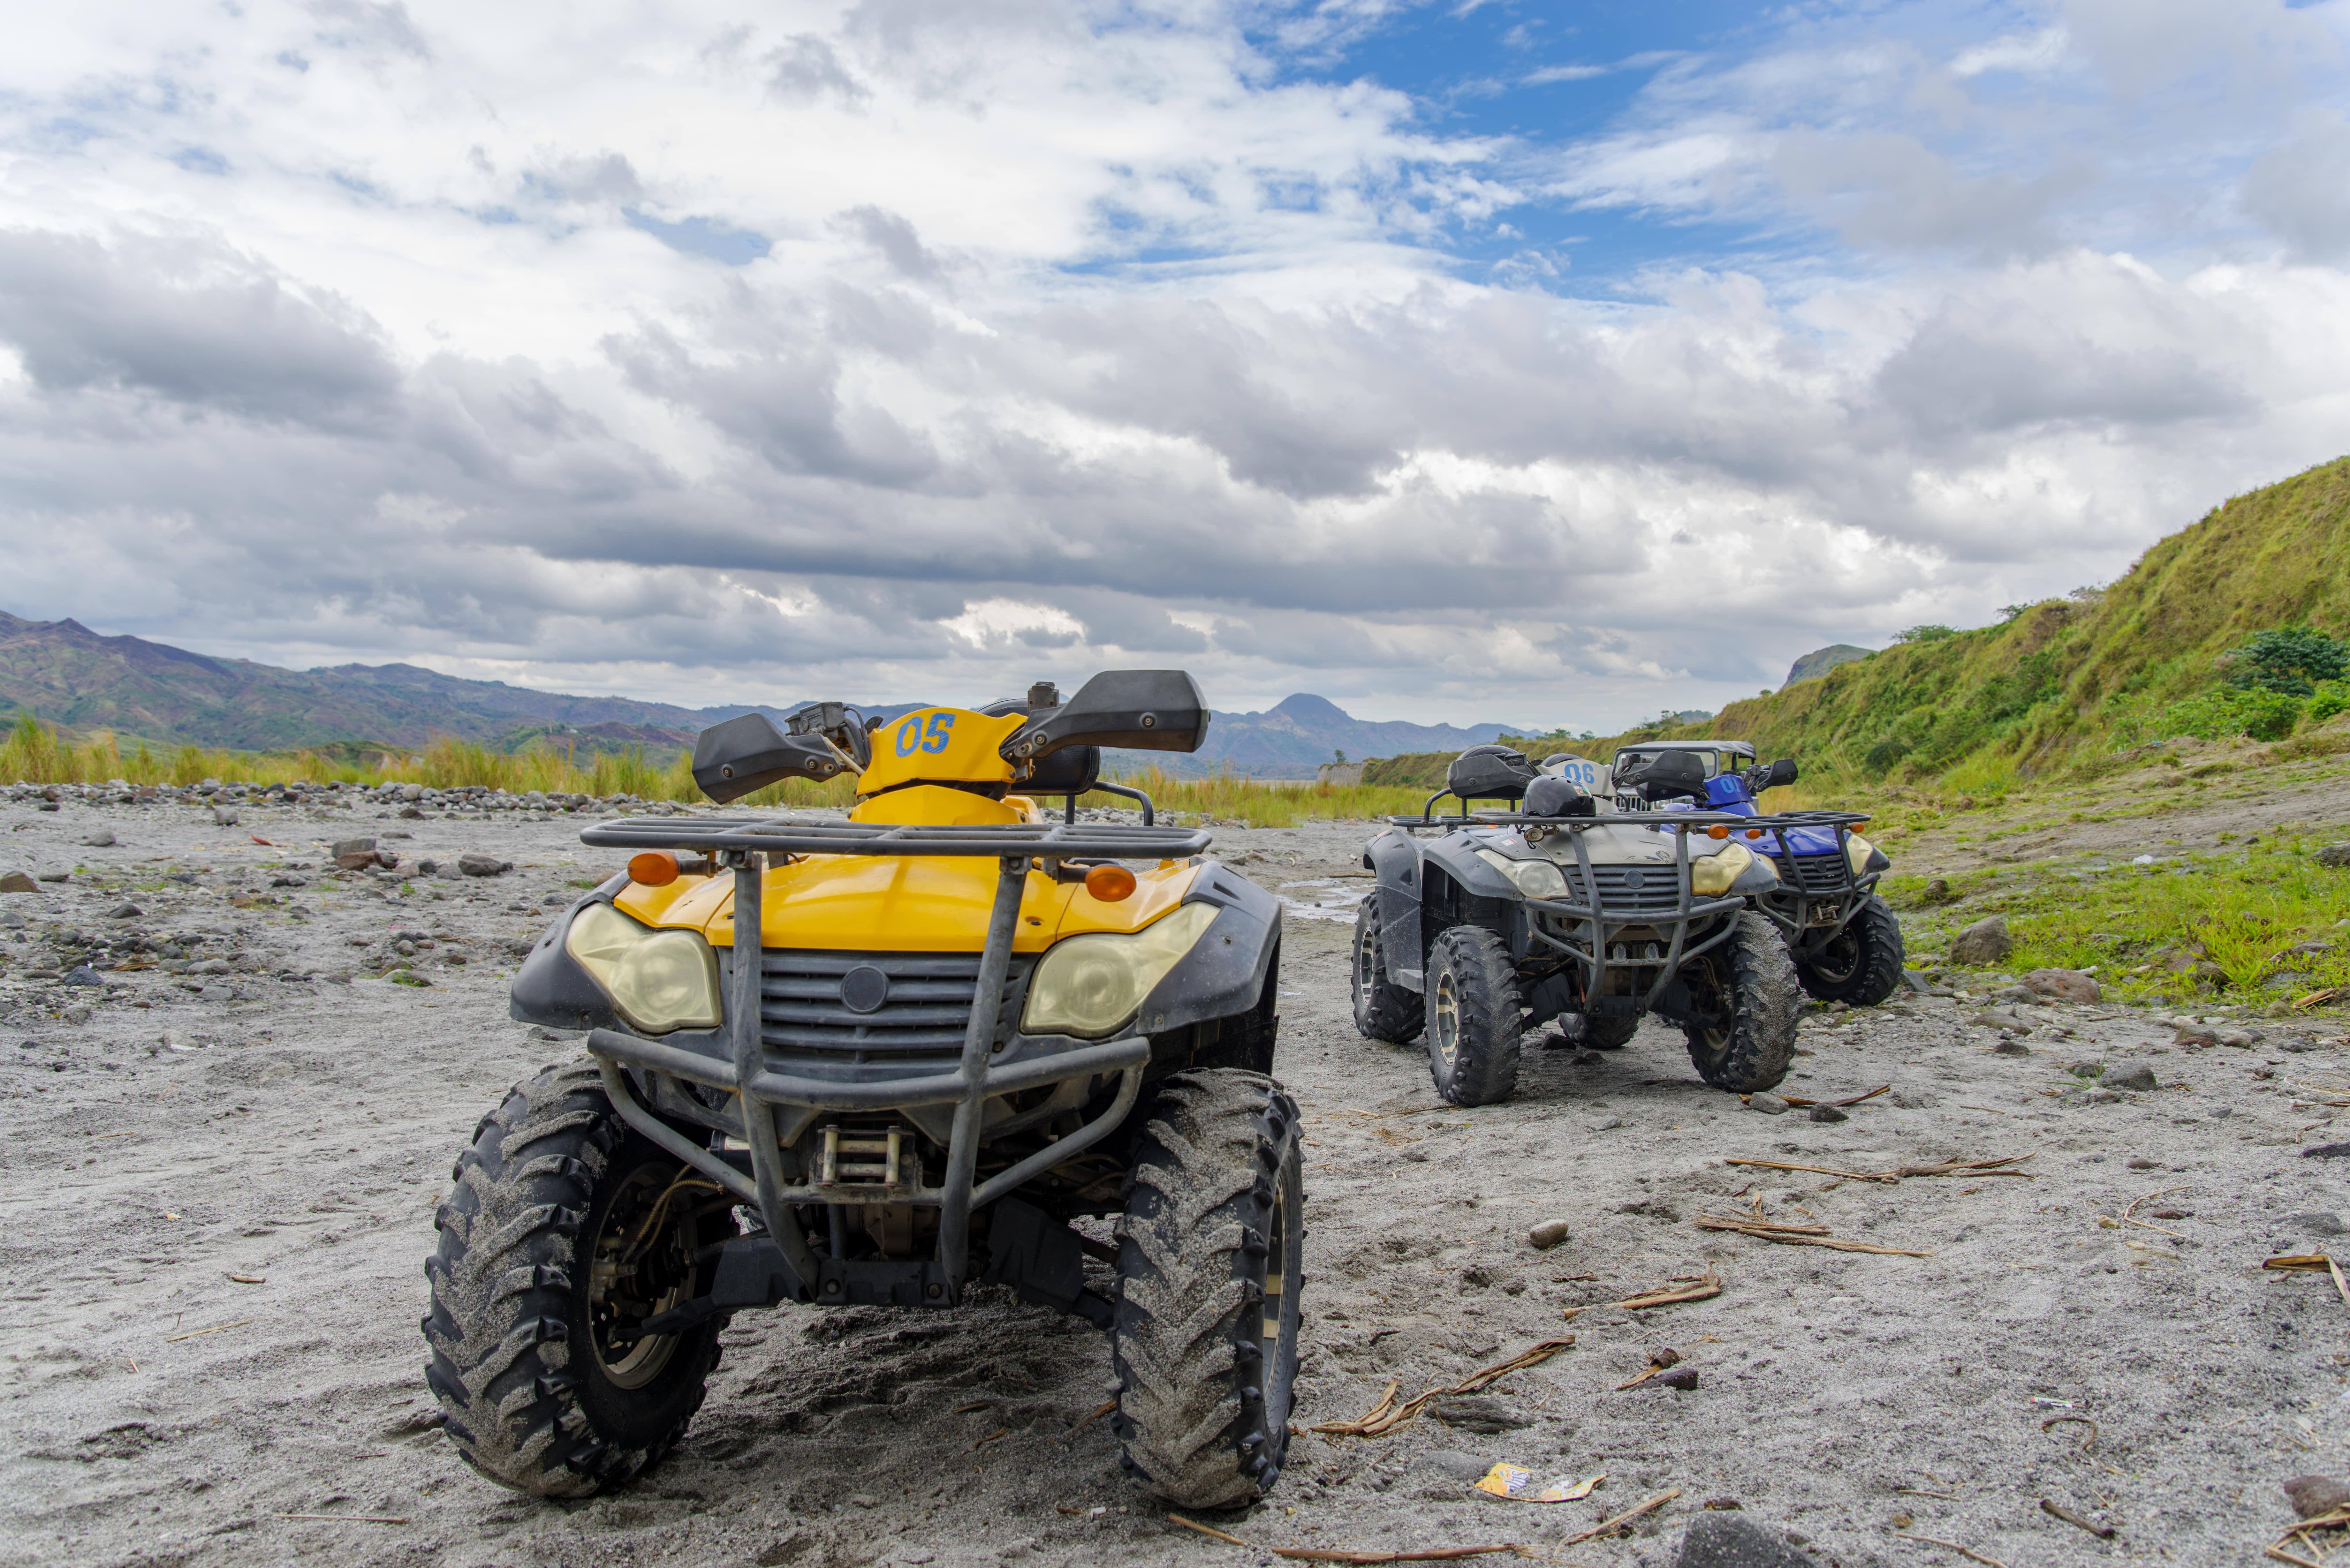 4x4 ATV parked at the foot of Mt. Pinatubo